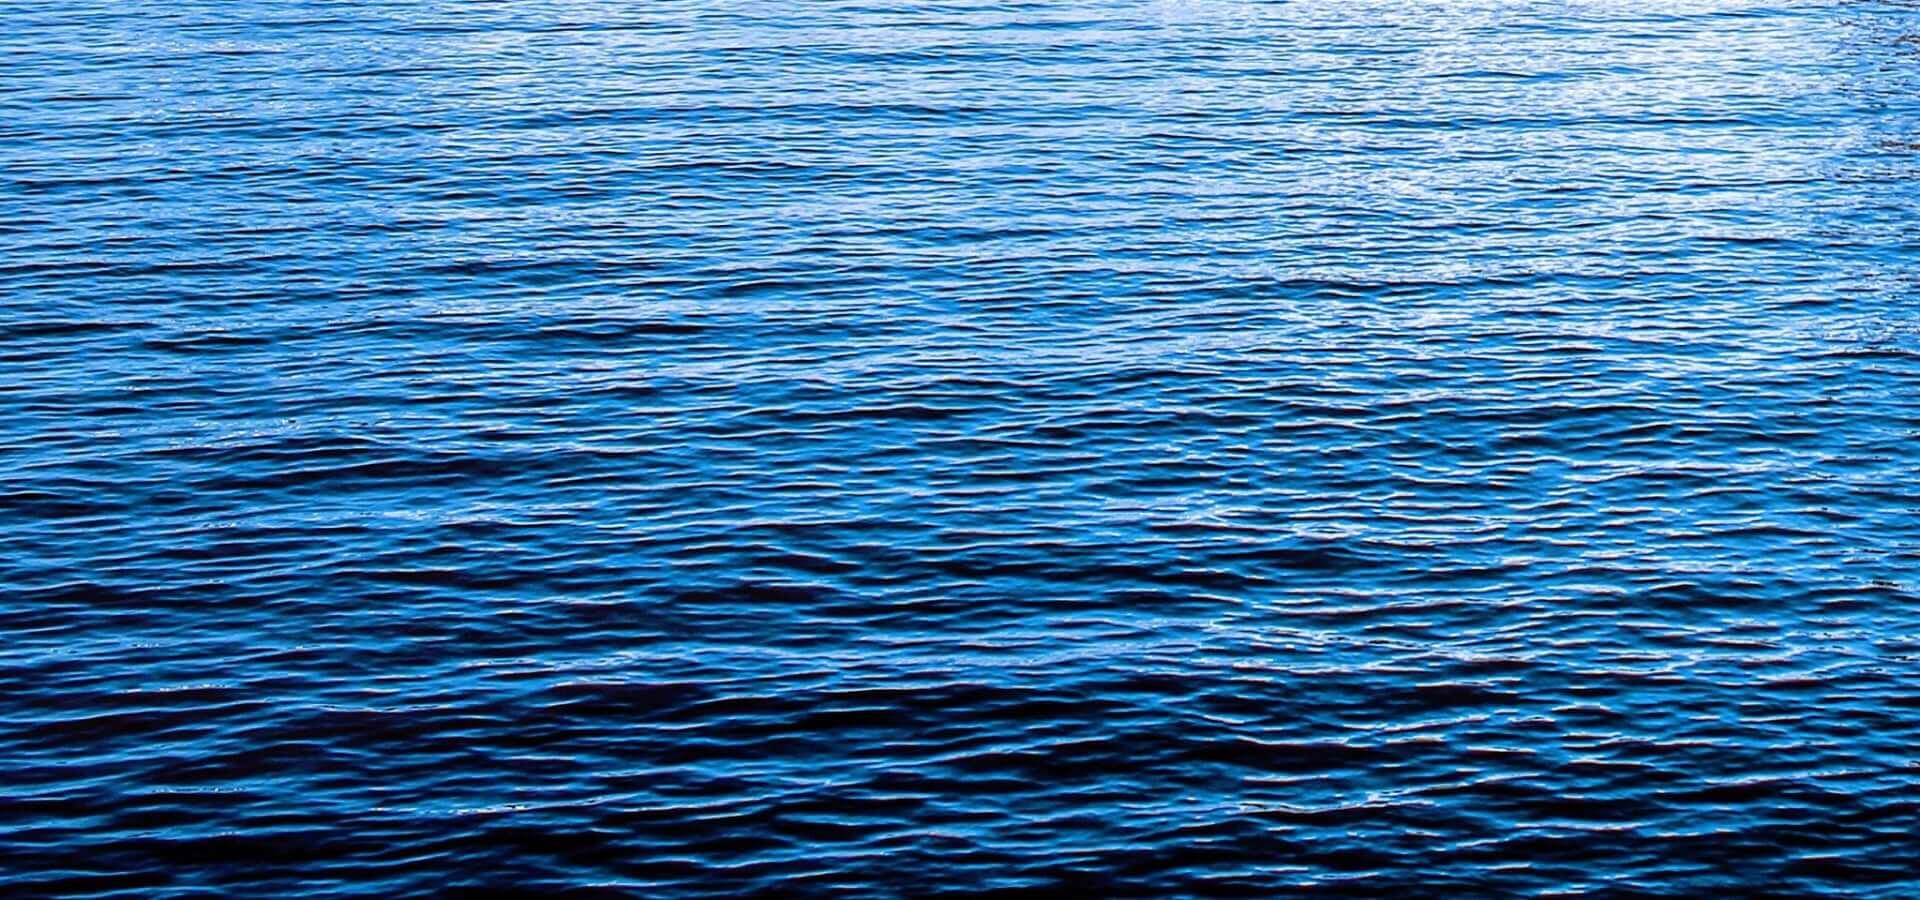 Water in port